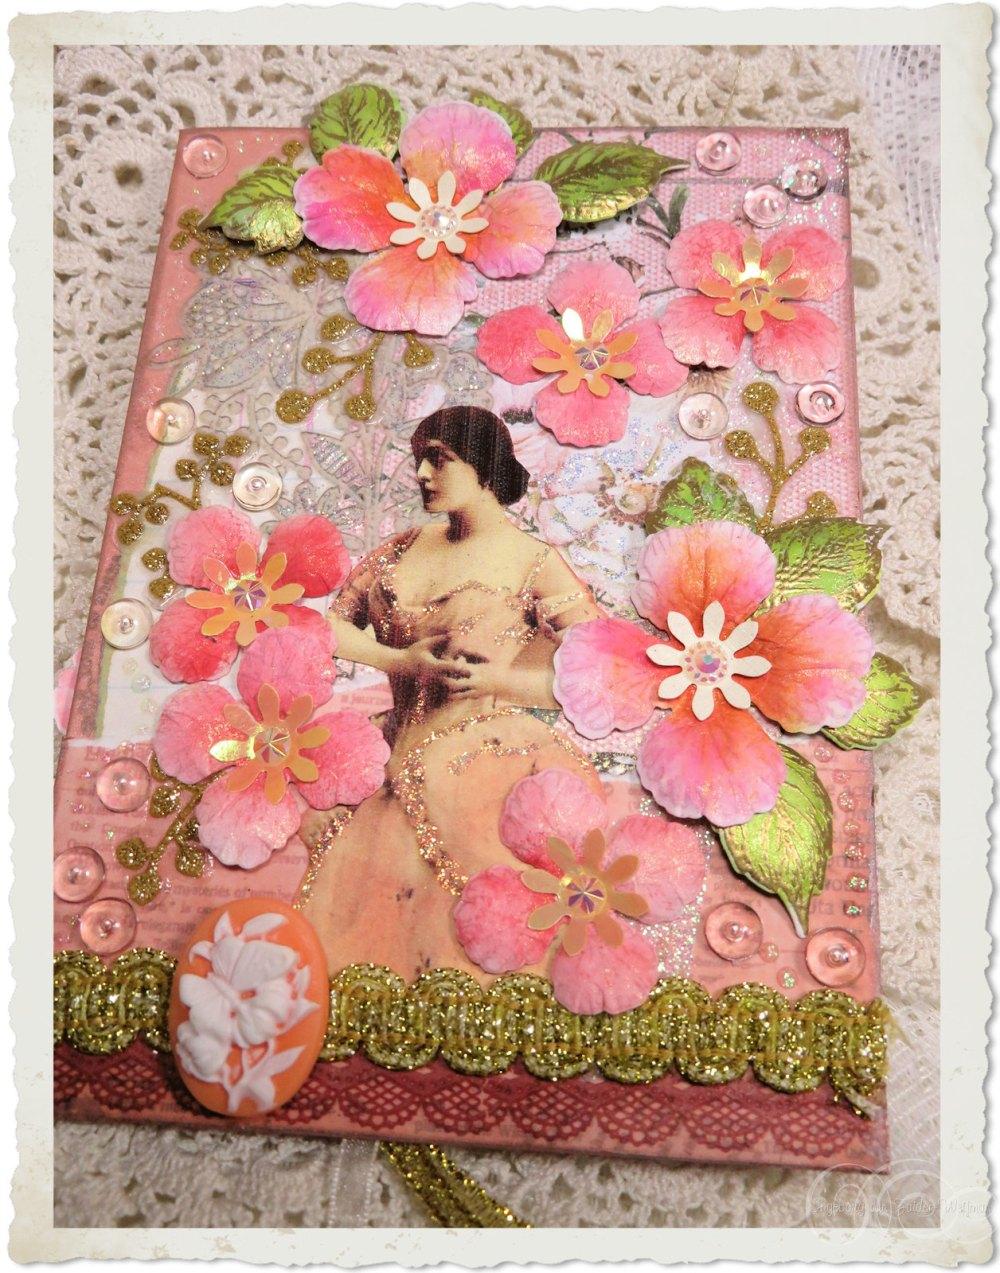 Handmade vintage style card with lady and pastel peach Heartfelt Creations flowers from Oakberry Lane series by Ingeborg van Zuiden Weijman